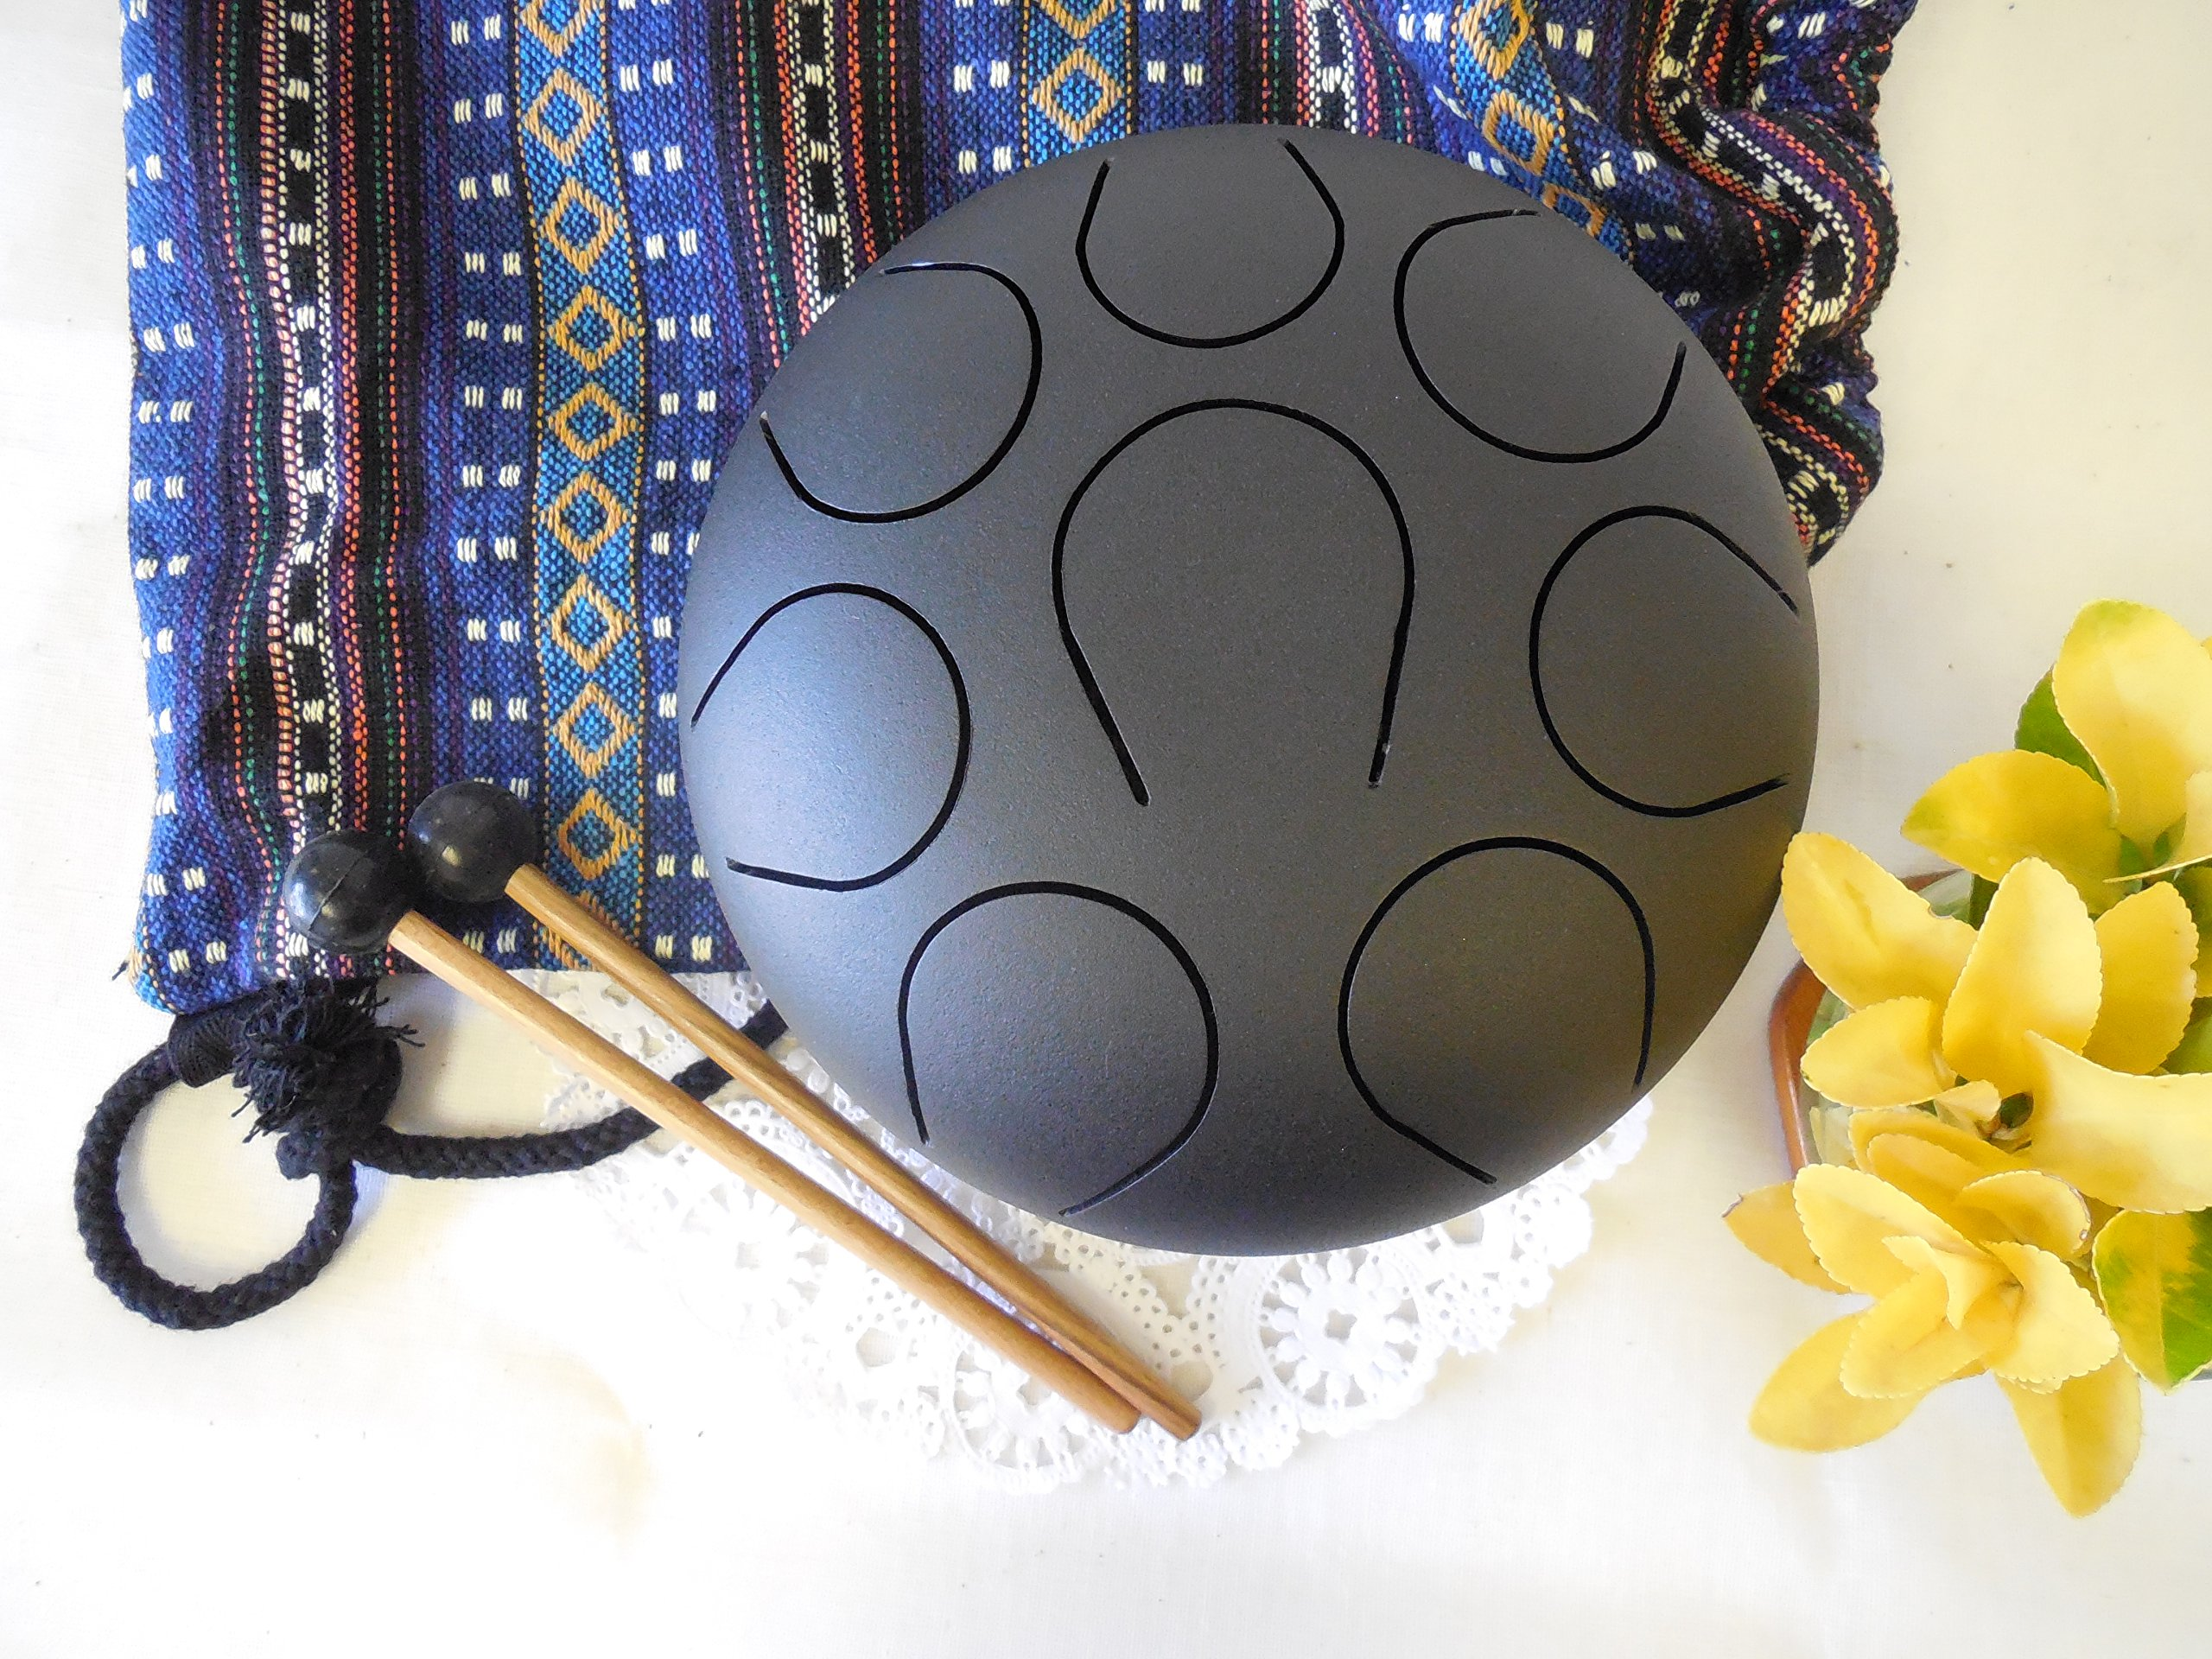 Hand Pan Drum Steel Tongue Drum, Wuyou 9in Drum, Chakra Drum, Hand Tuned Perfect Sound Healing, Birthday Gift, Black